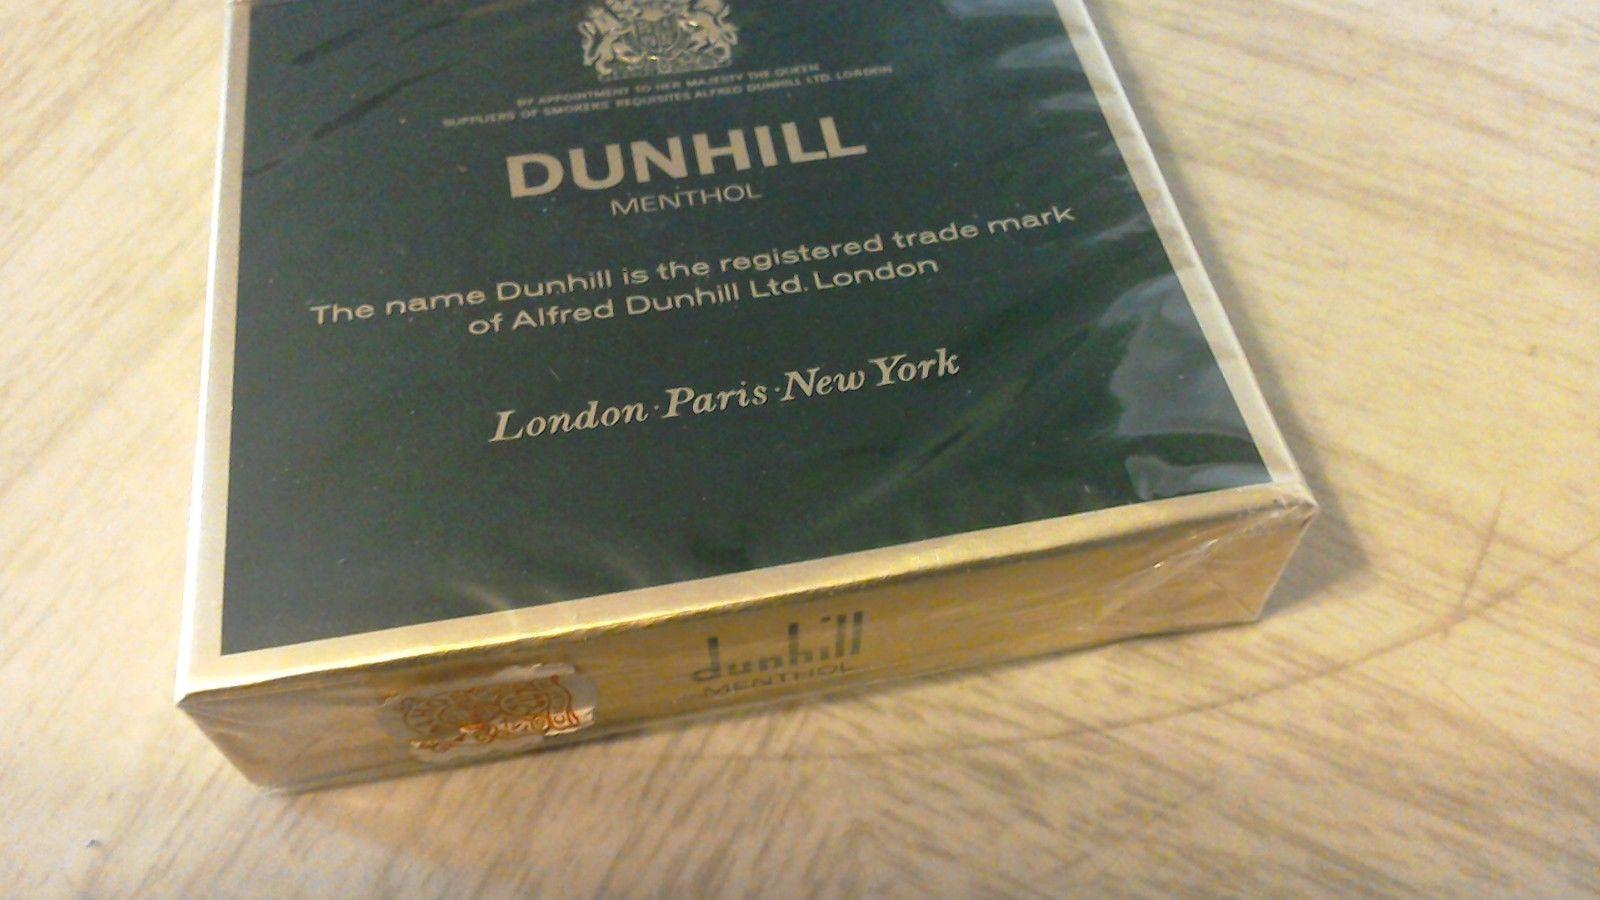 Dunhill International Menthol Cigarettes 10 Cartons Mild 20